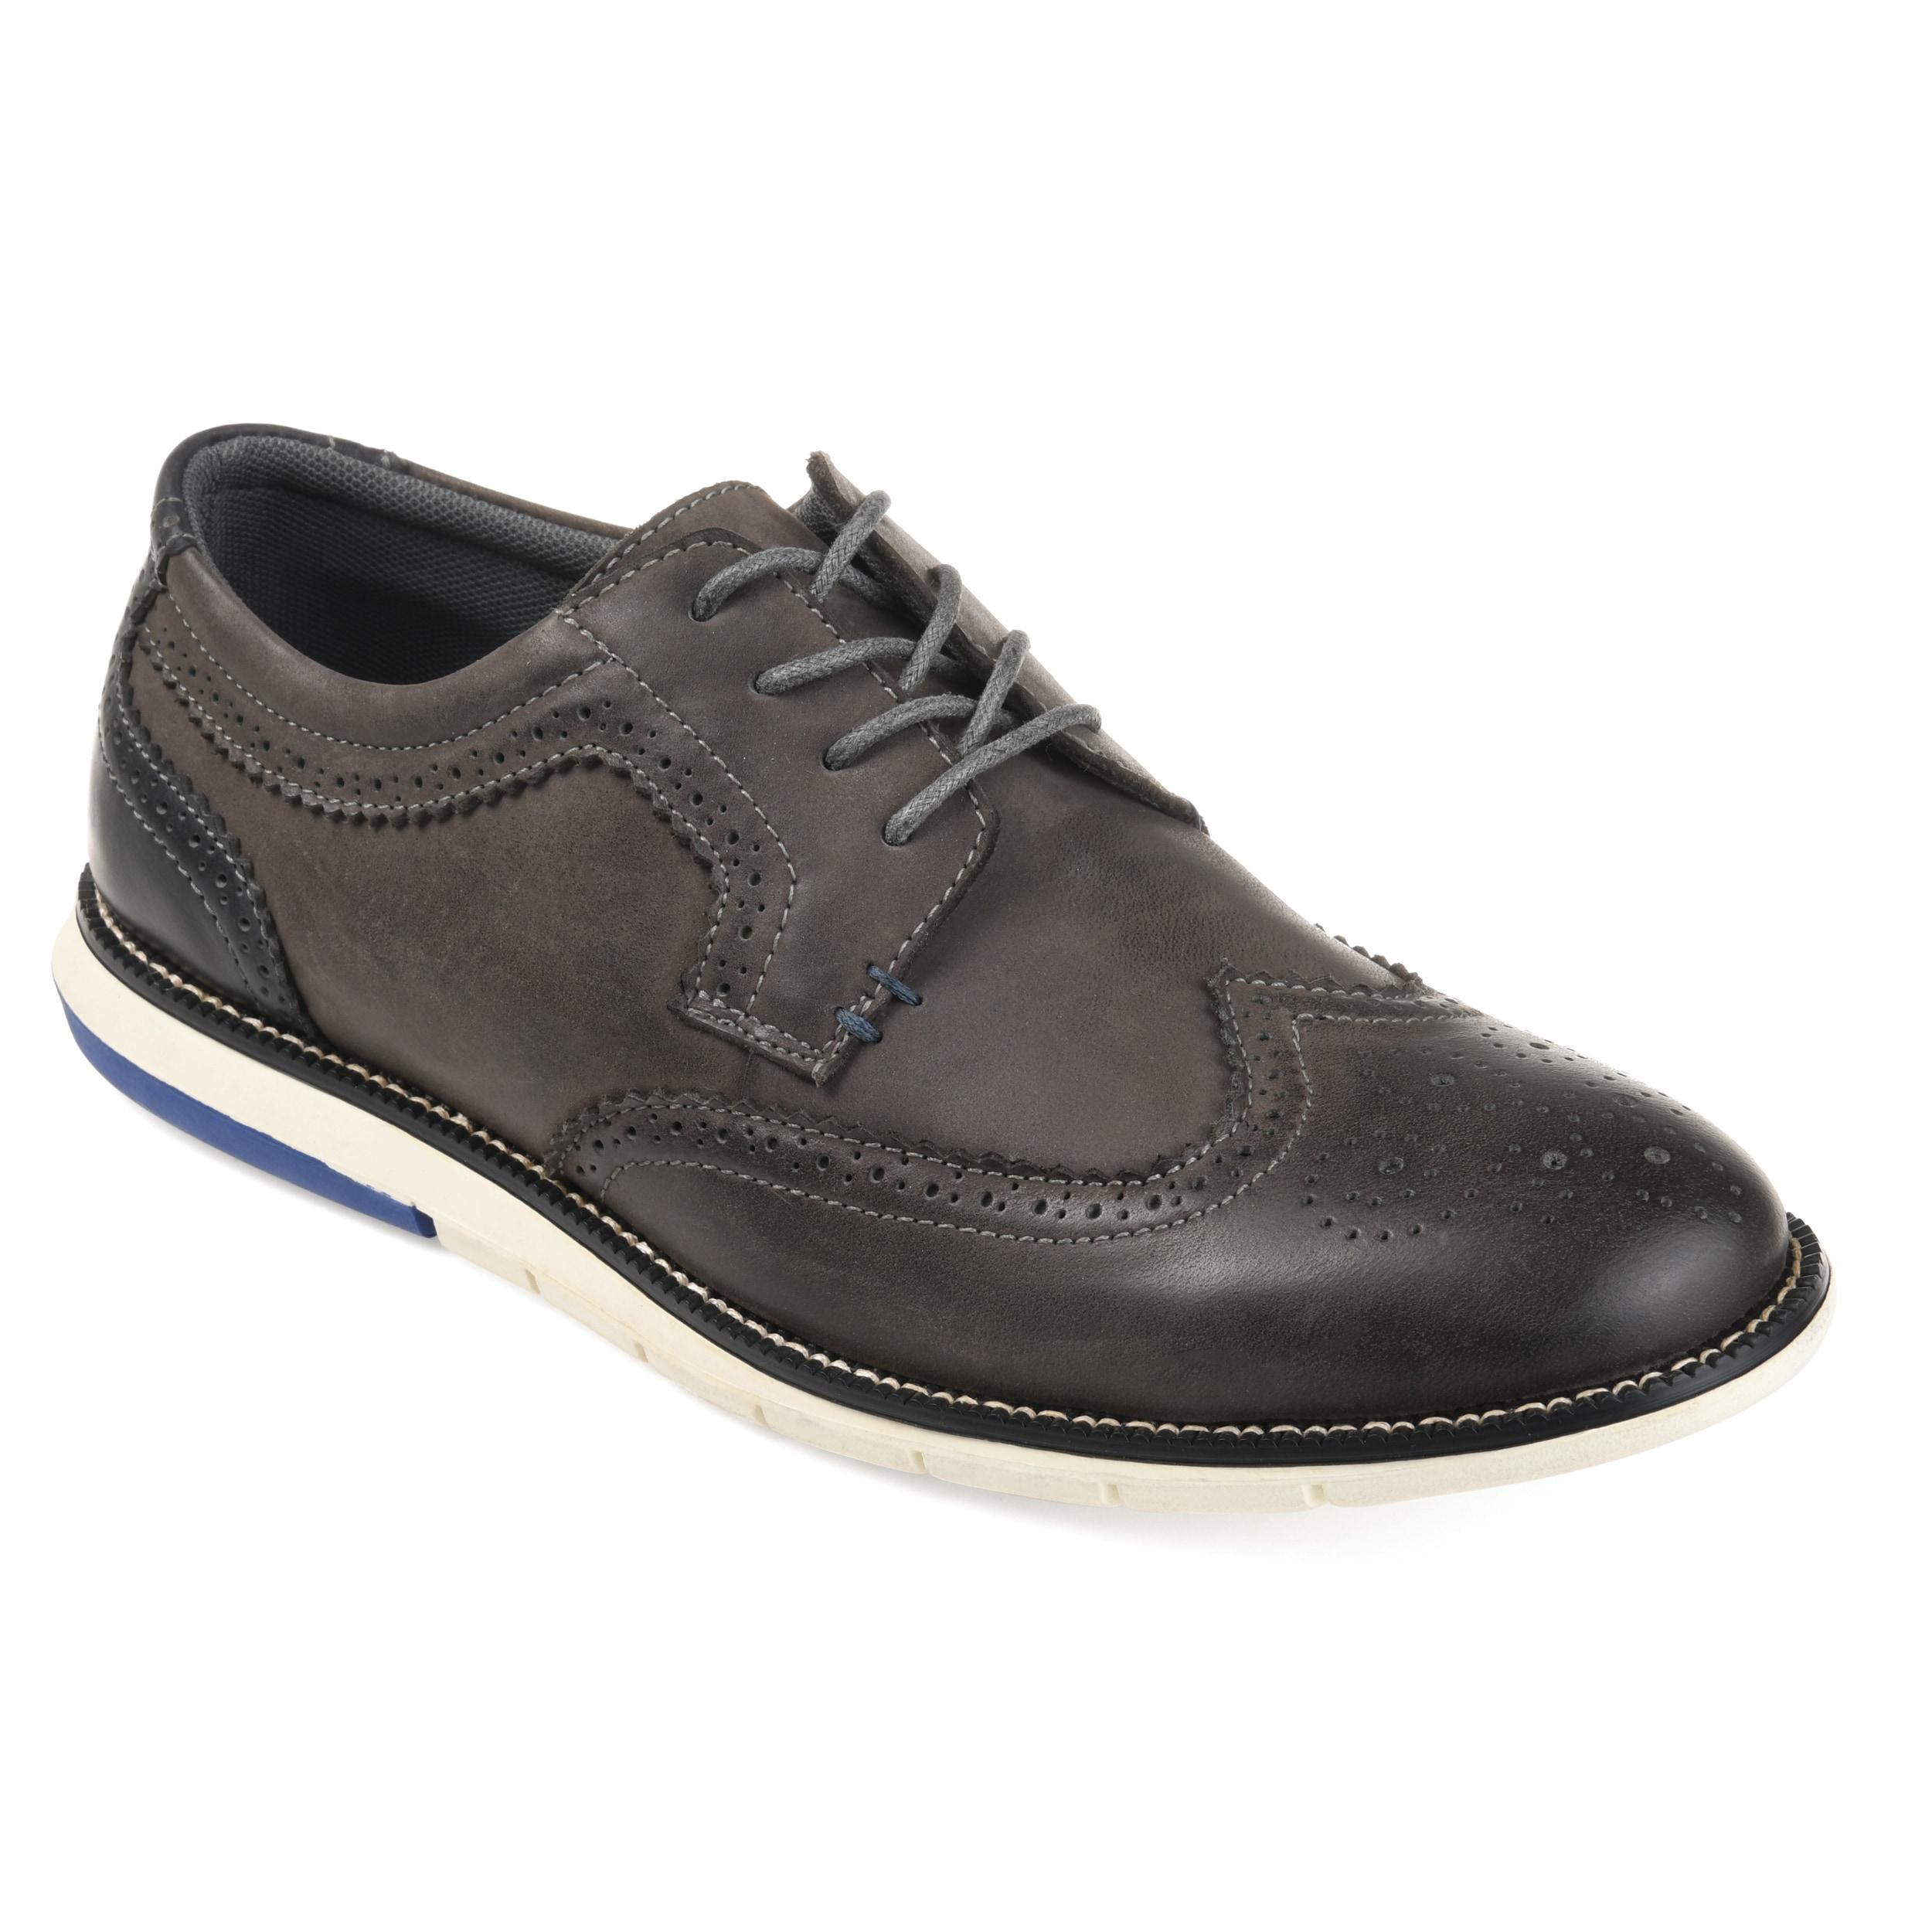 4bbd57406cfa7 Shop Vance Co. Men's 'Drake' Comfort-sole Genuine Leather Wingtip ...